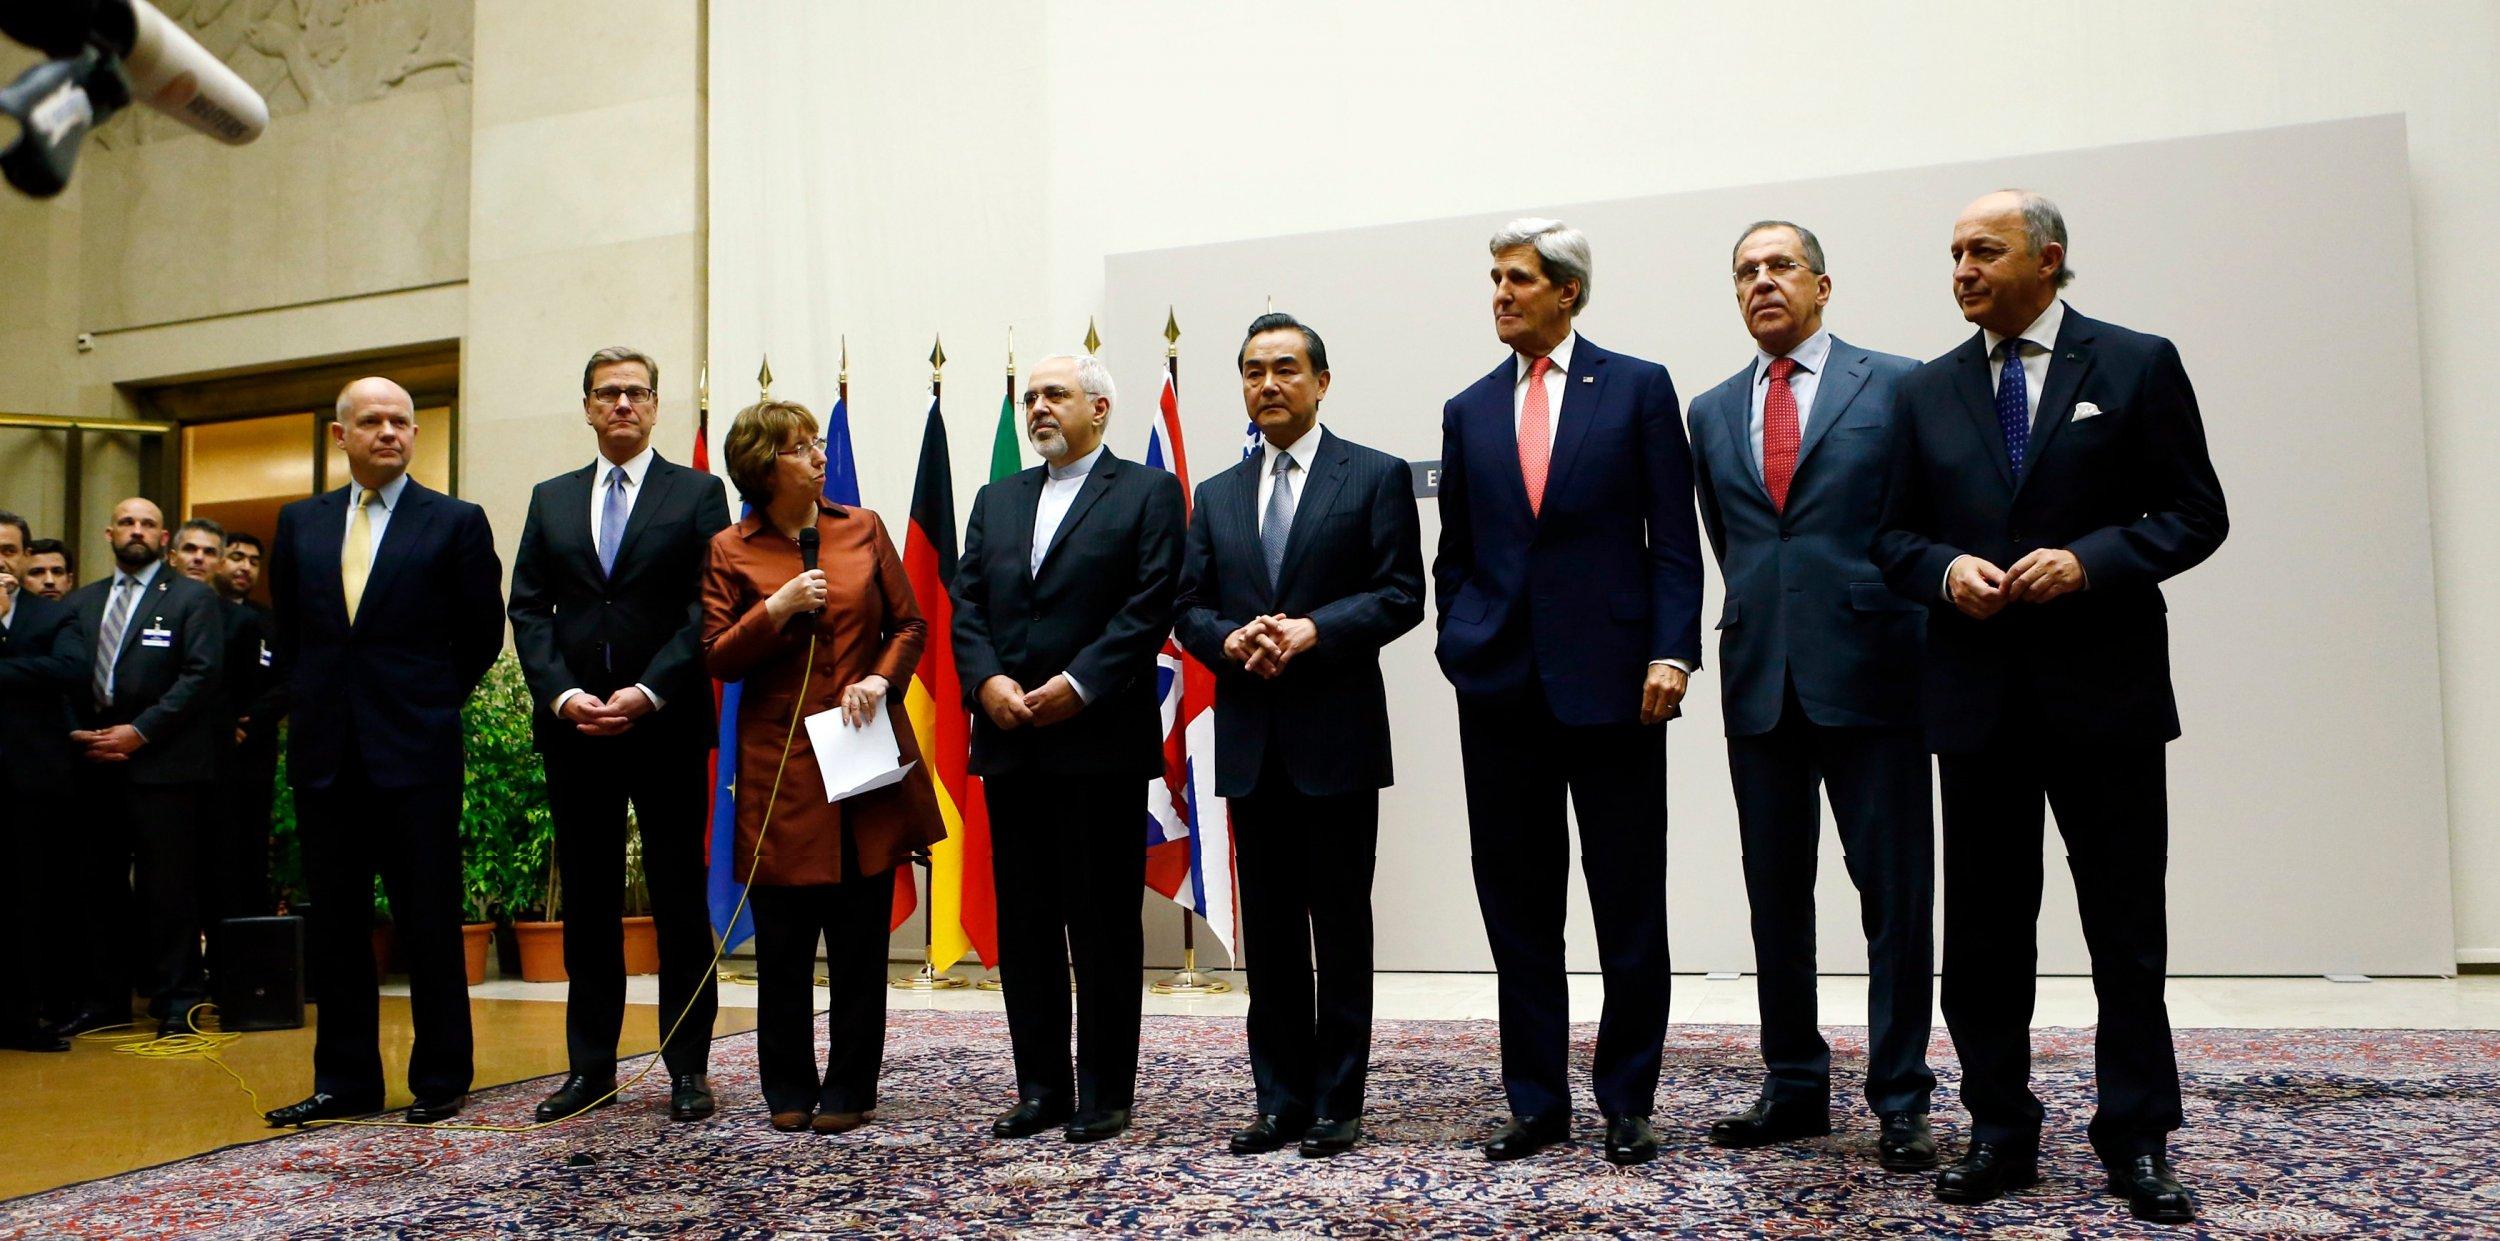 Israeli Leaders Iran Pact Is A Bad Deal